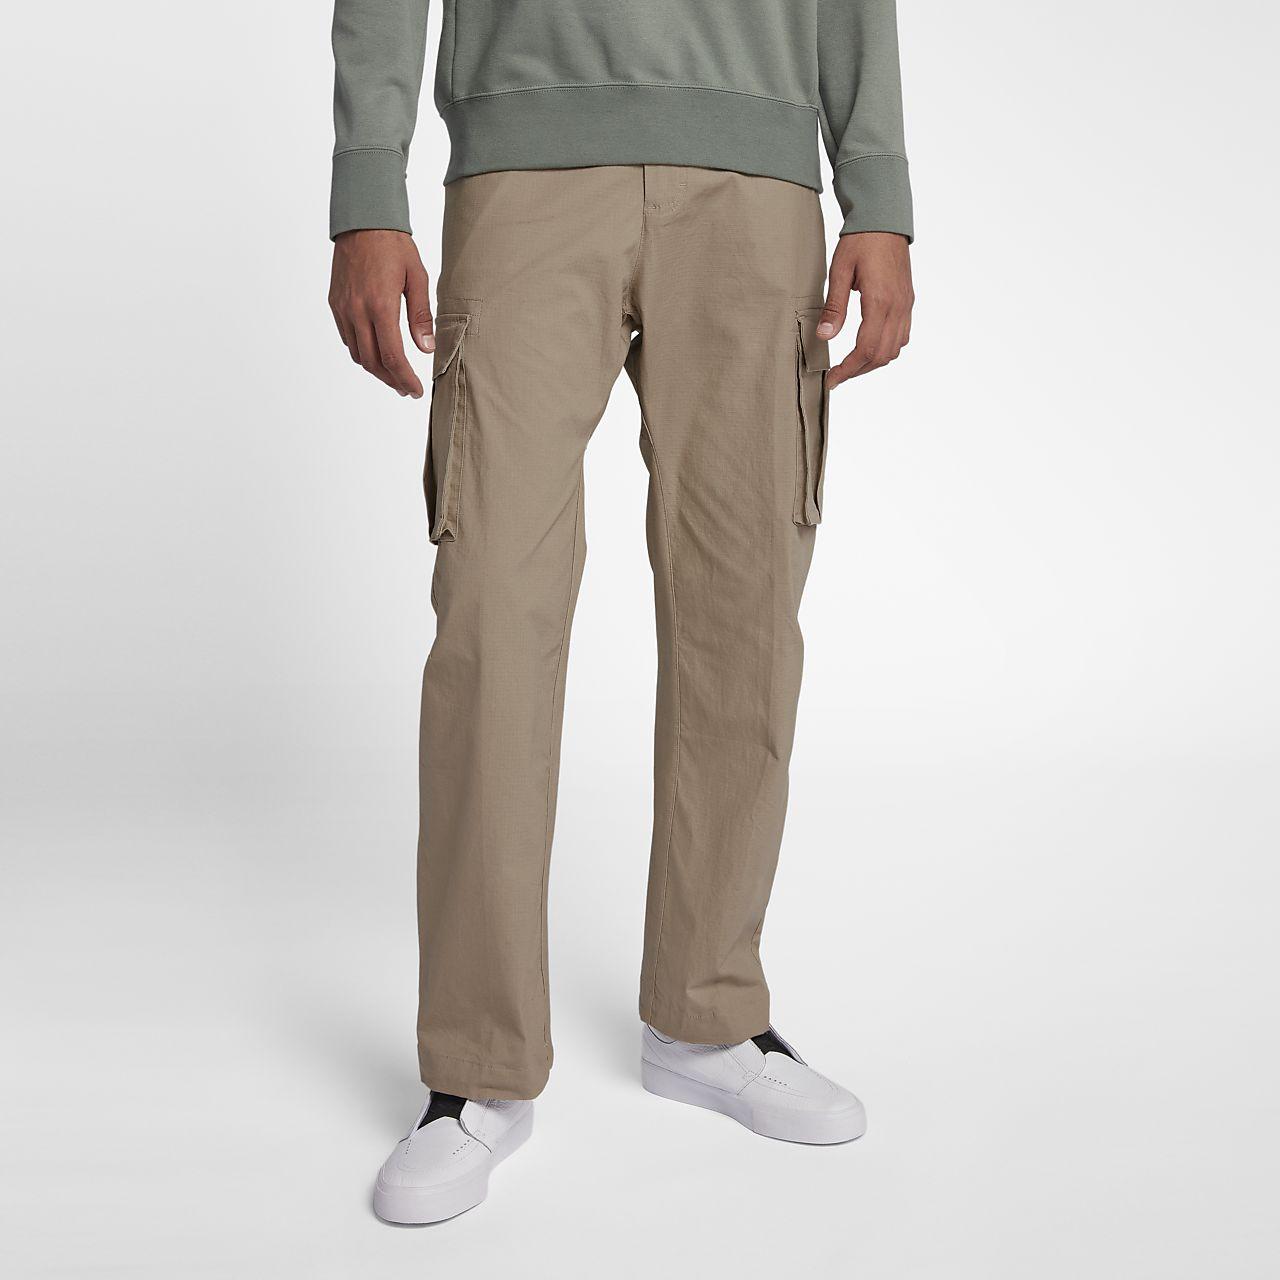 Ftm Nike Cargo Sb Men's Flex Pants Skate qqxEBS1